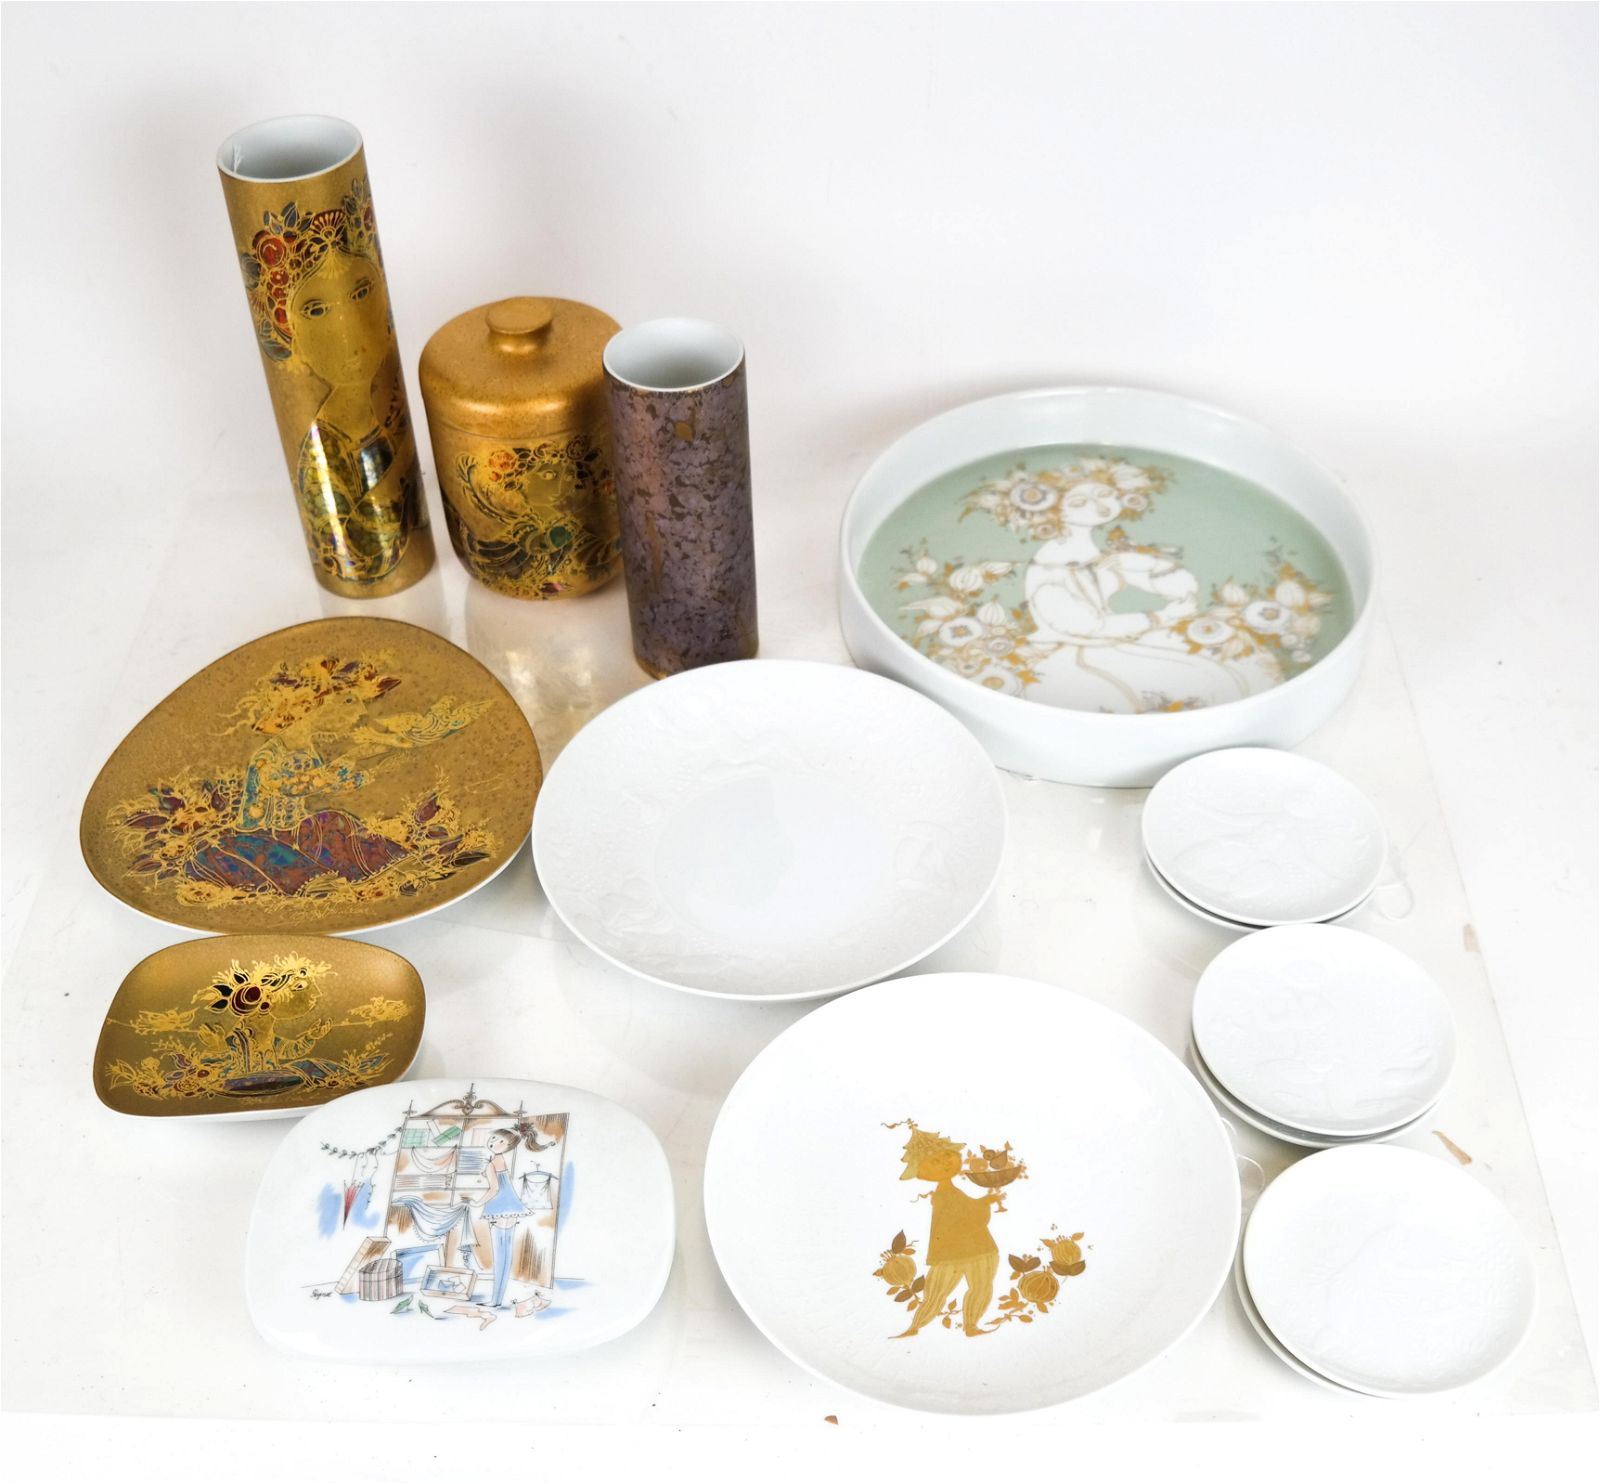 15 Pcs. Bjorn Winblad for Rosenthal Porcelain